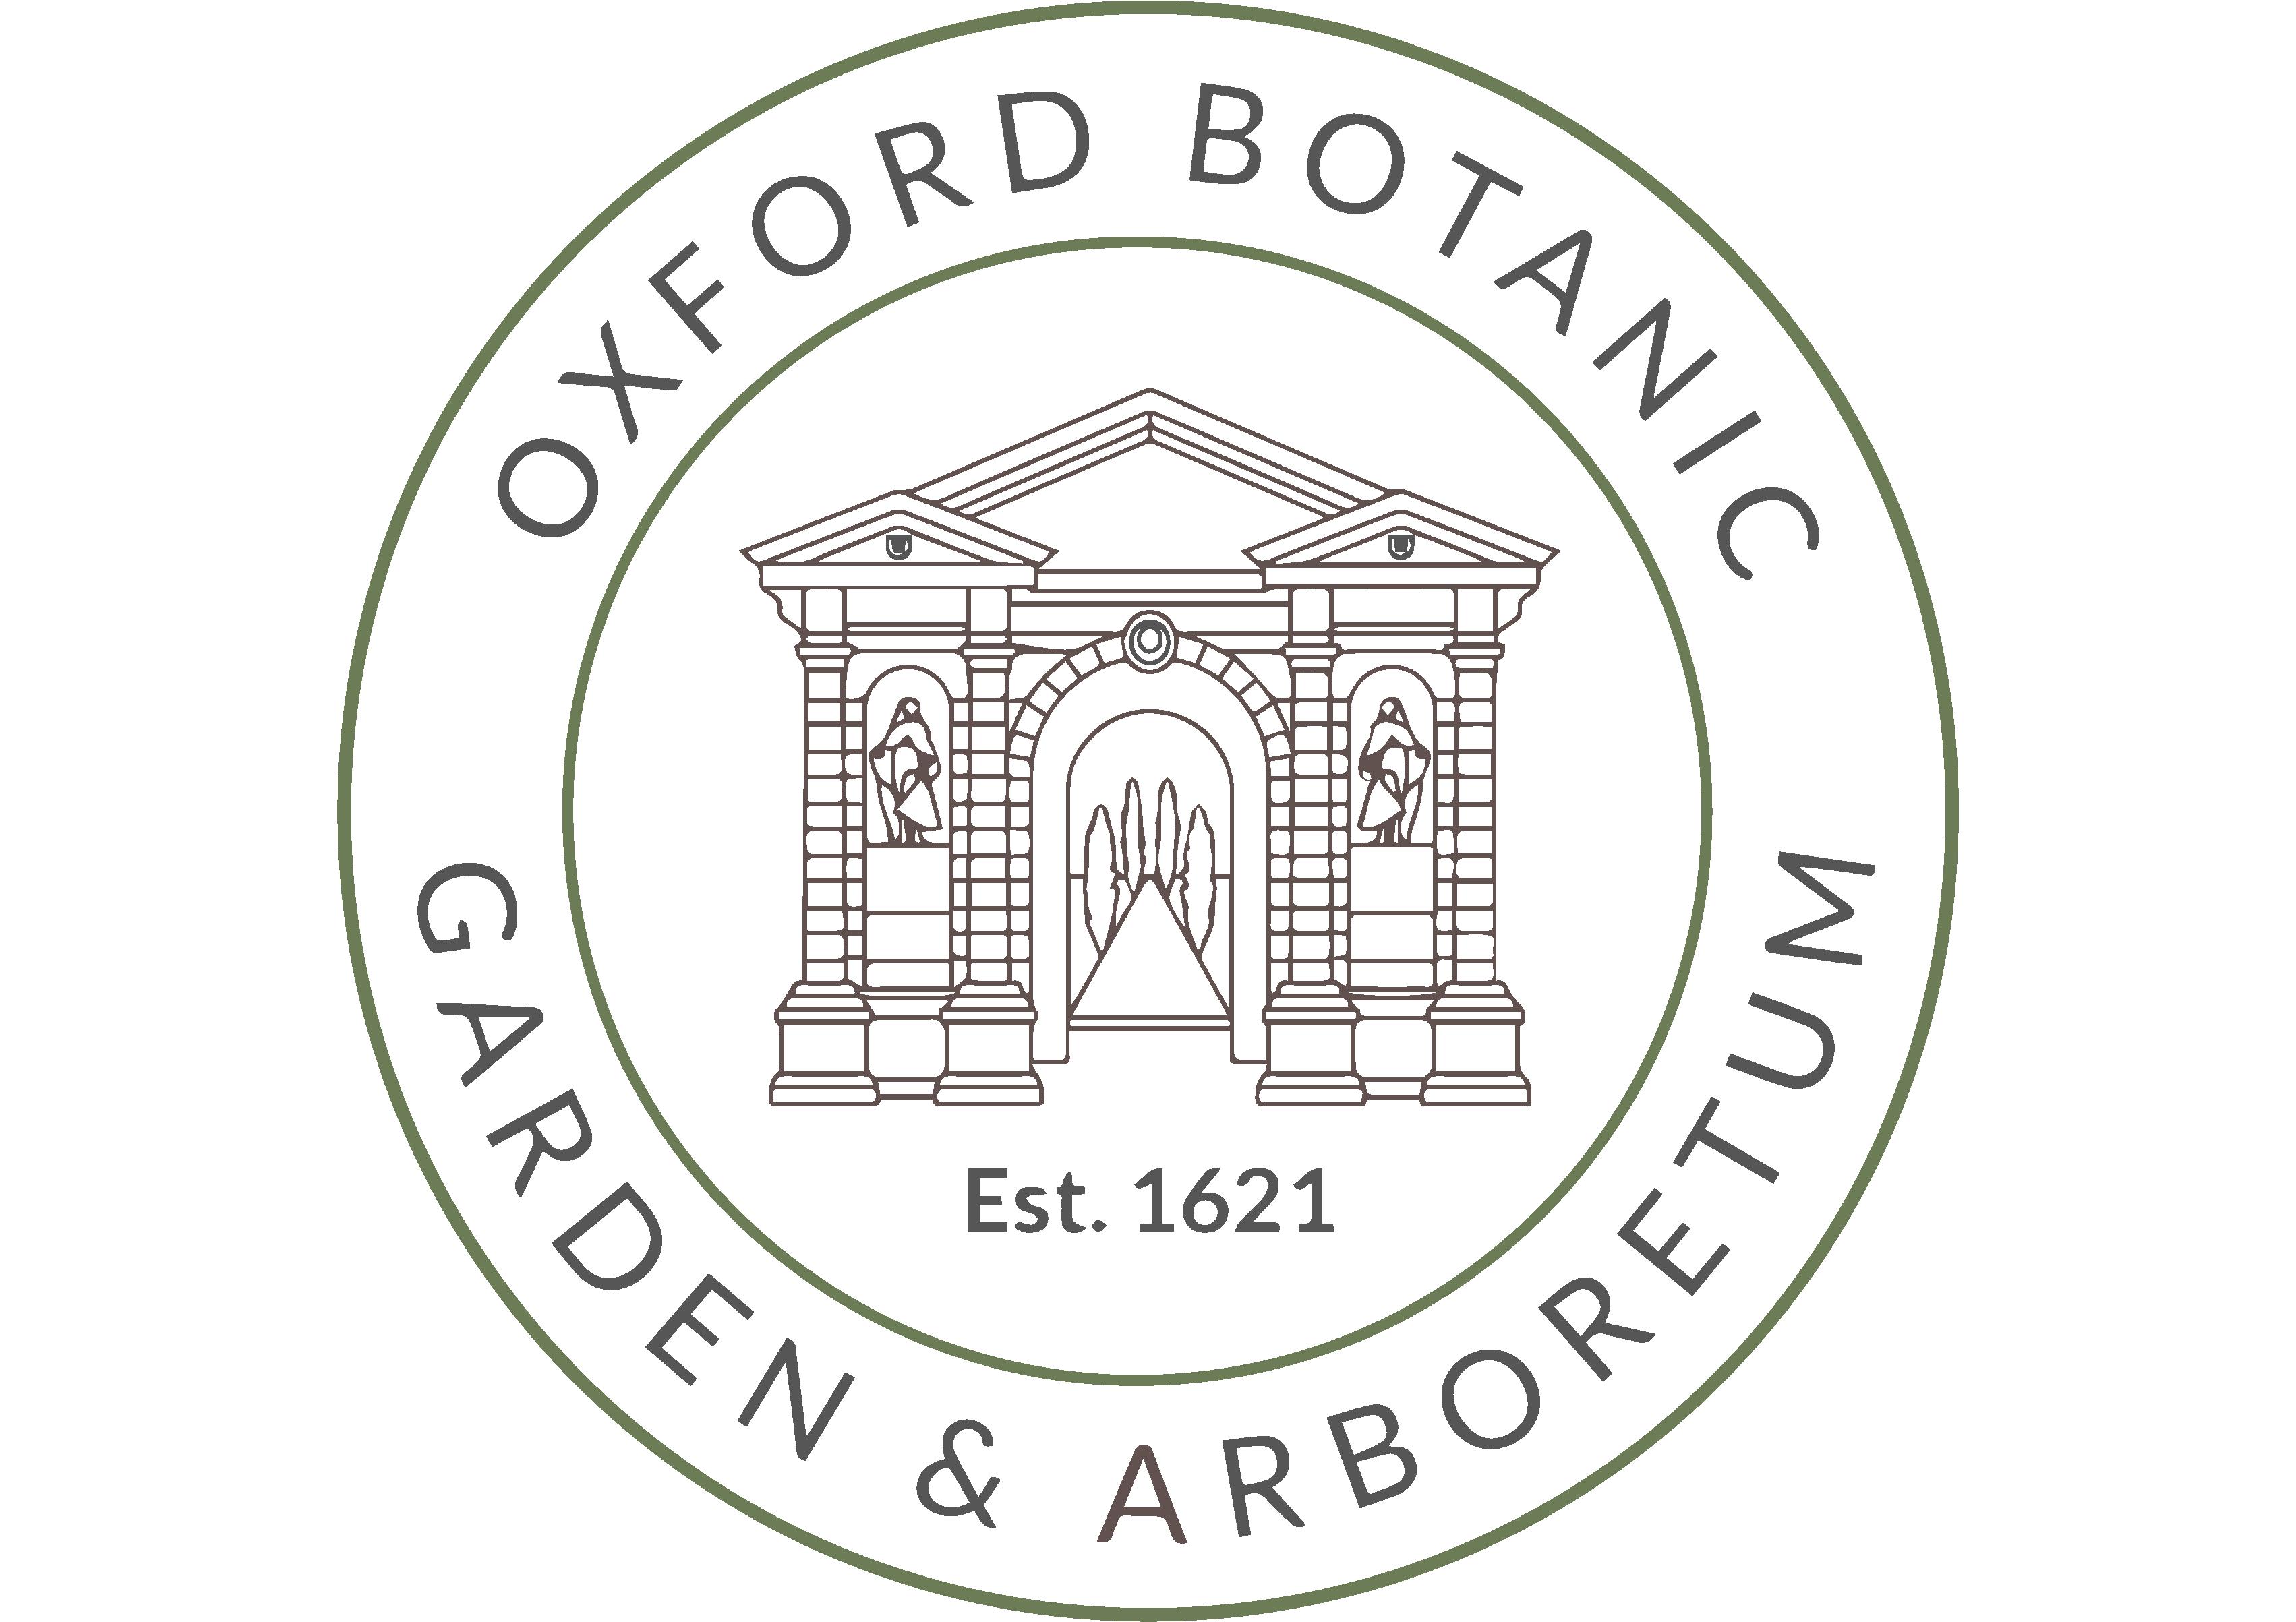 The Botanic Garden and Harcourt Arboretum